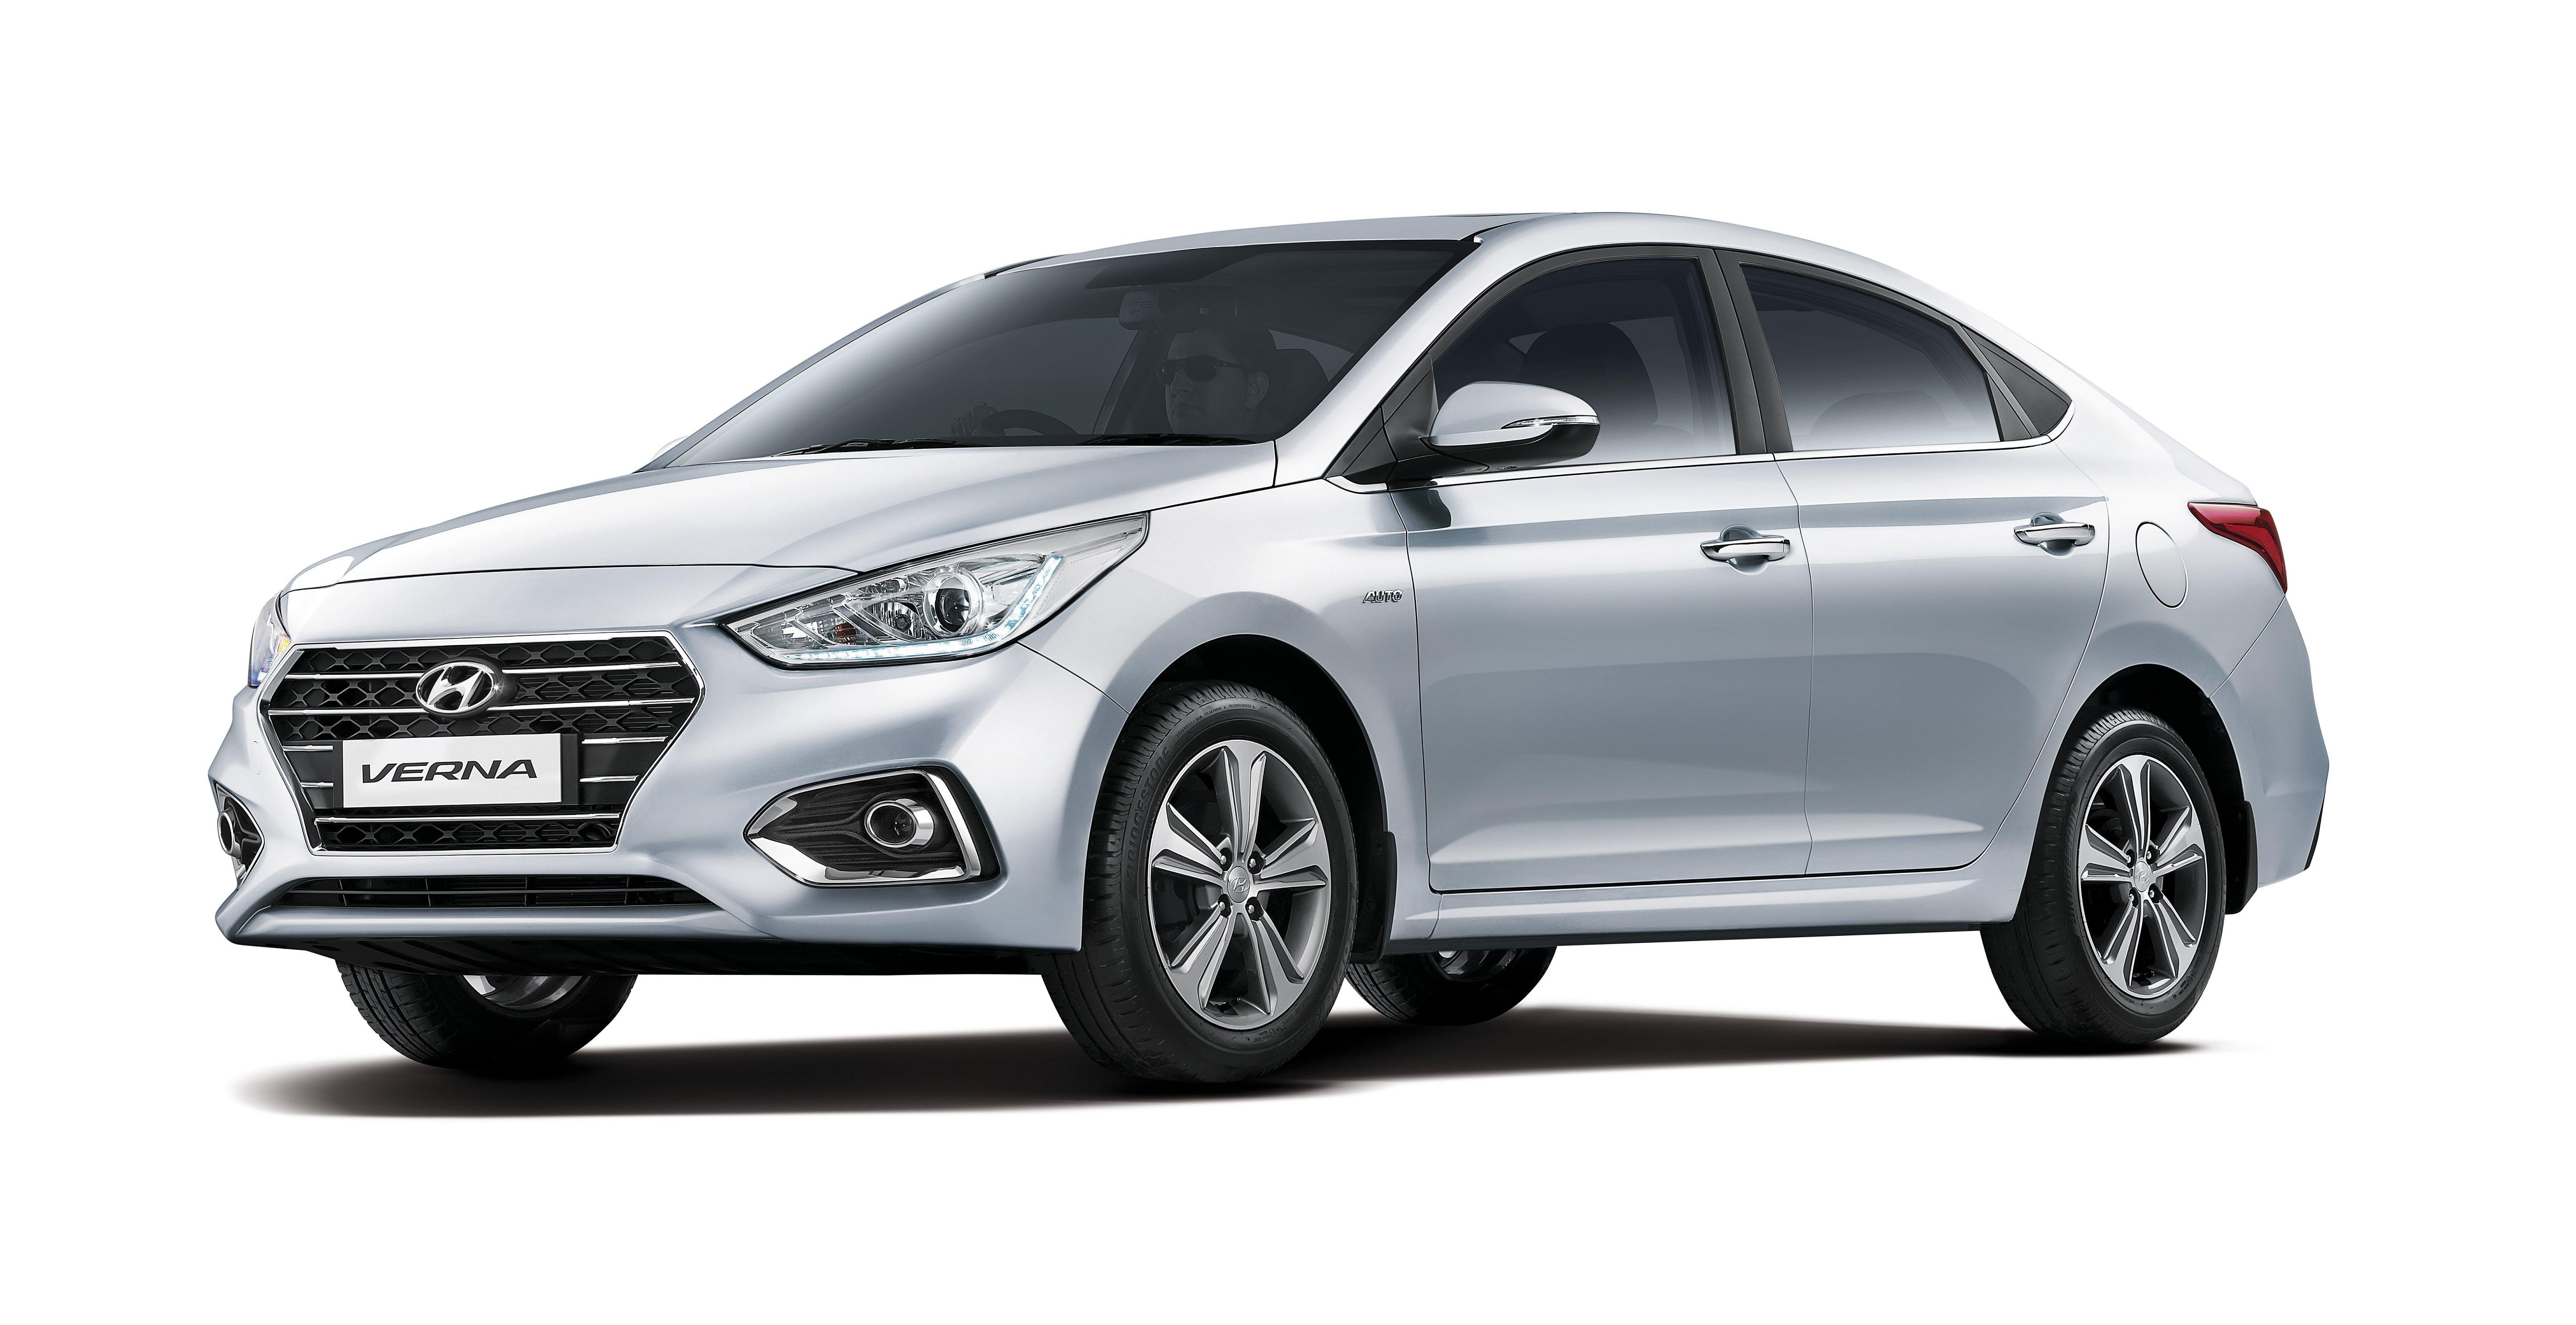 New 2017 hyundai verna vs honda city comparison price for Honda or hyundai